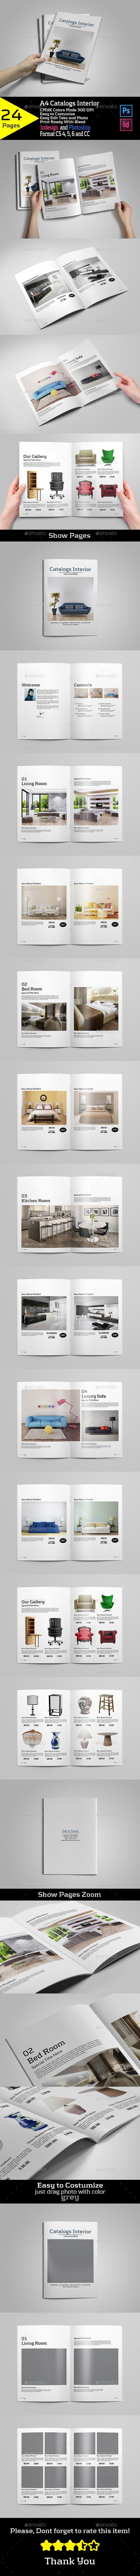 A4 Catalogs Interior - Brochures Print Templates